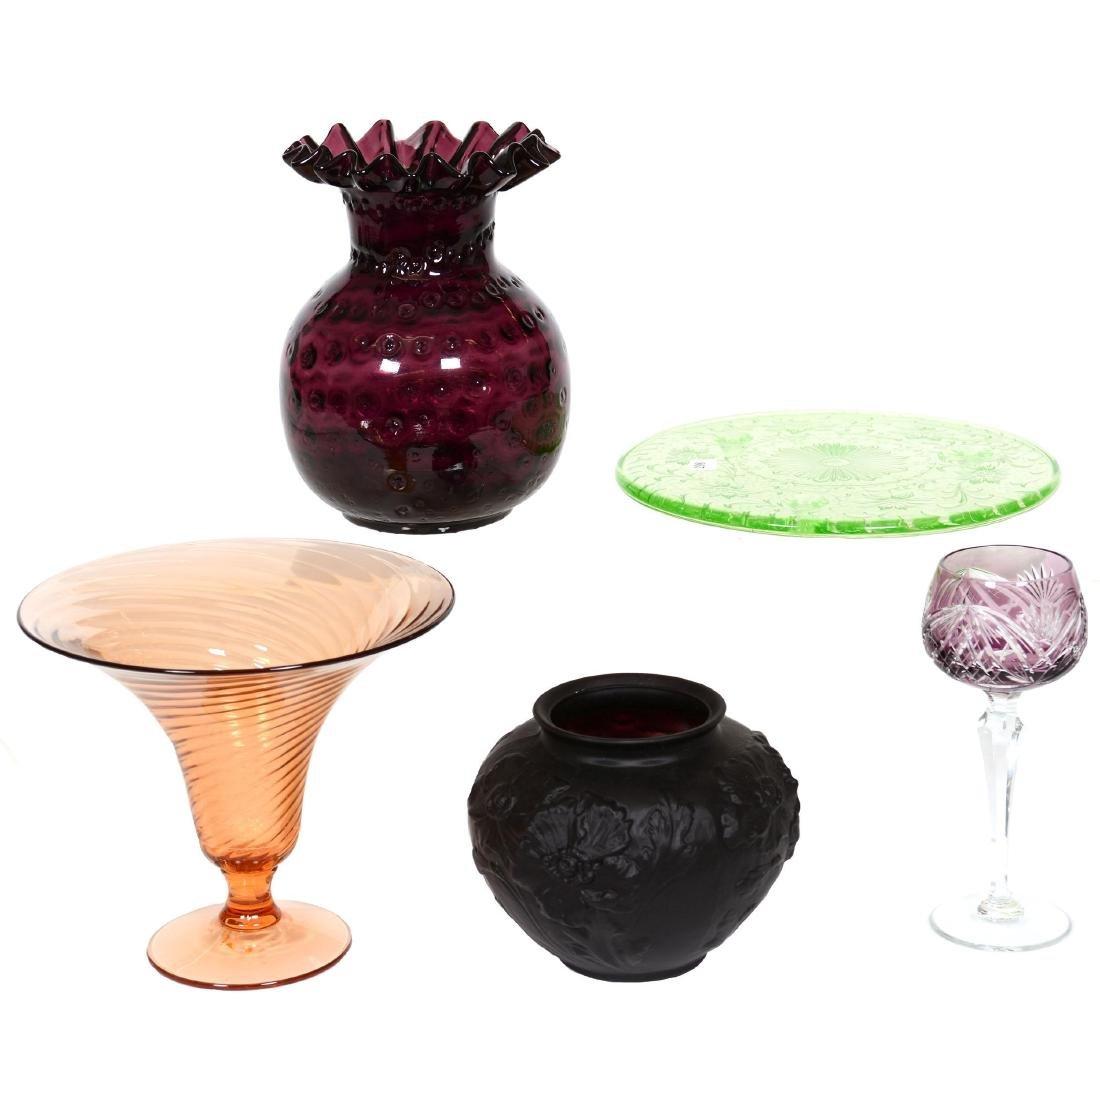 (5) Assorted Art Glass Items